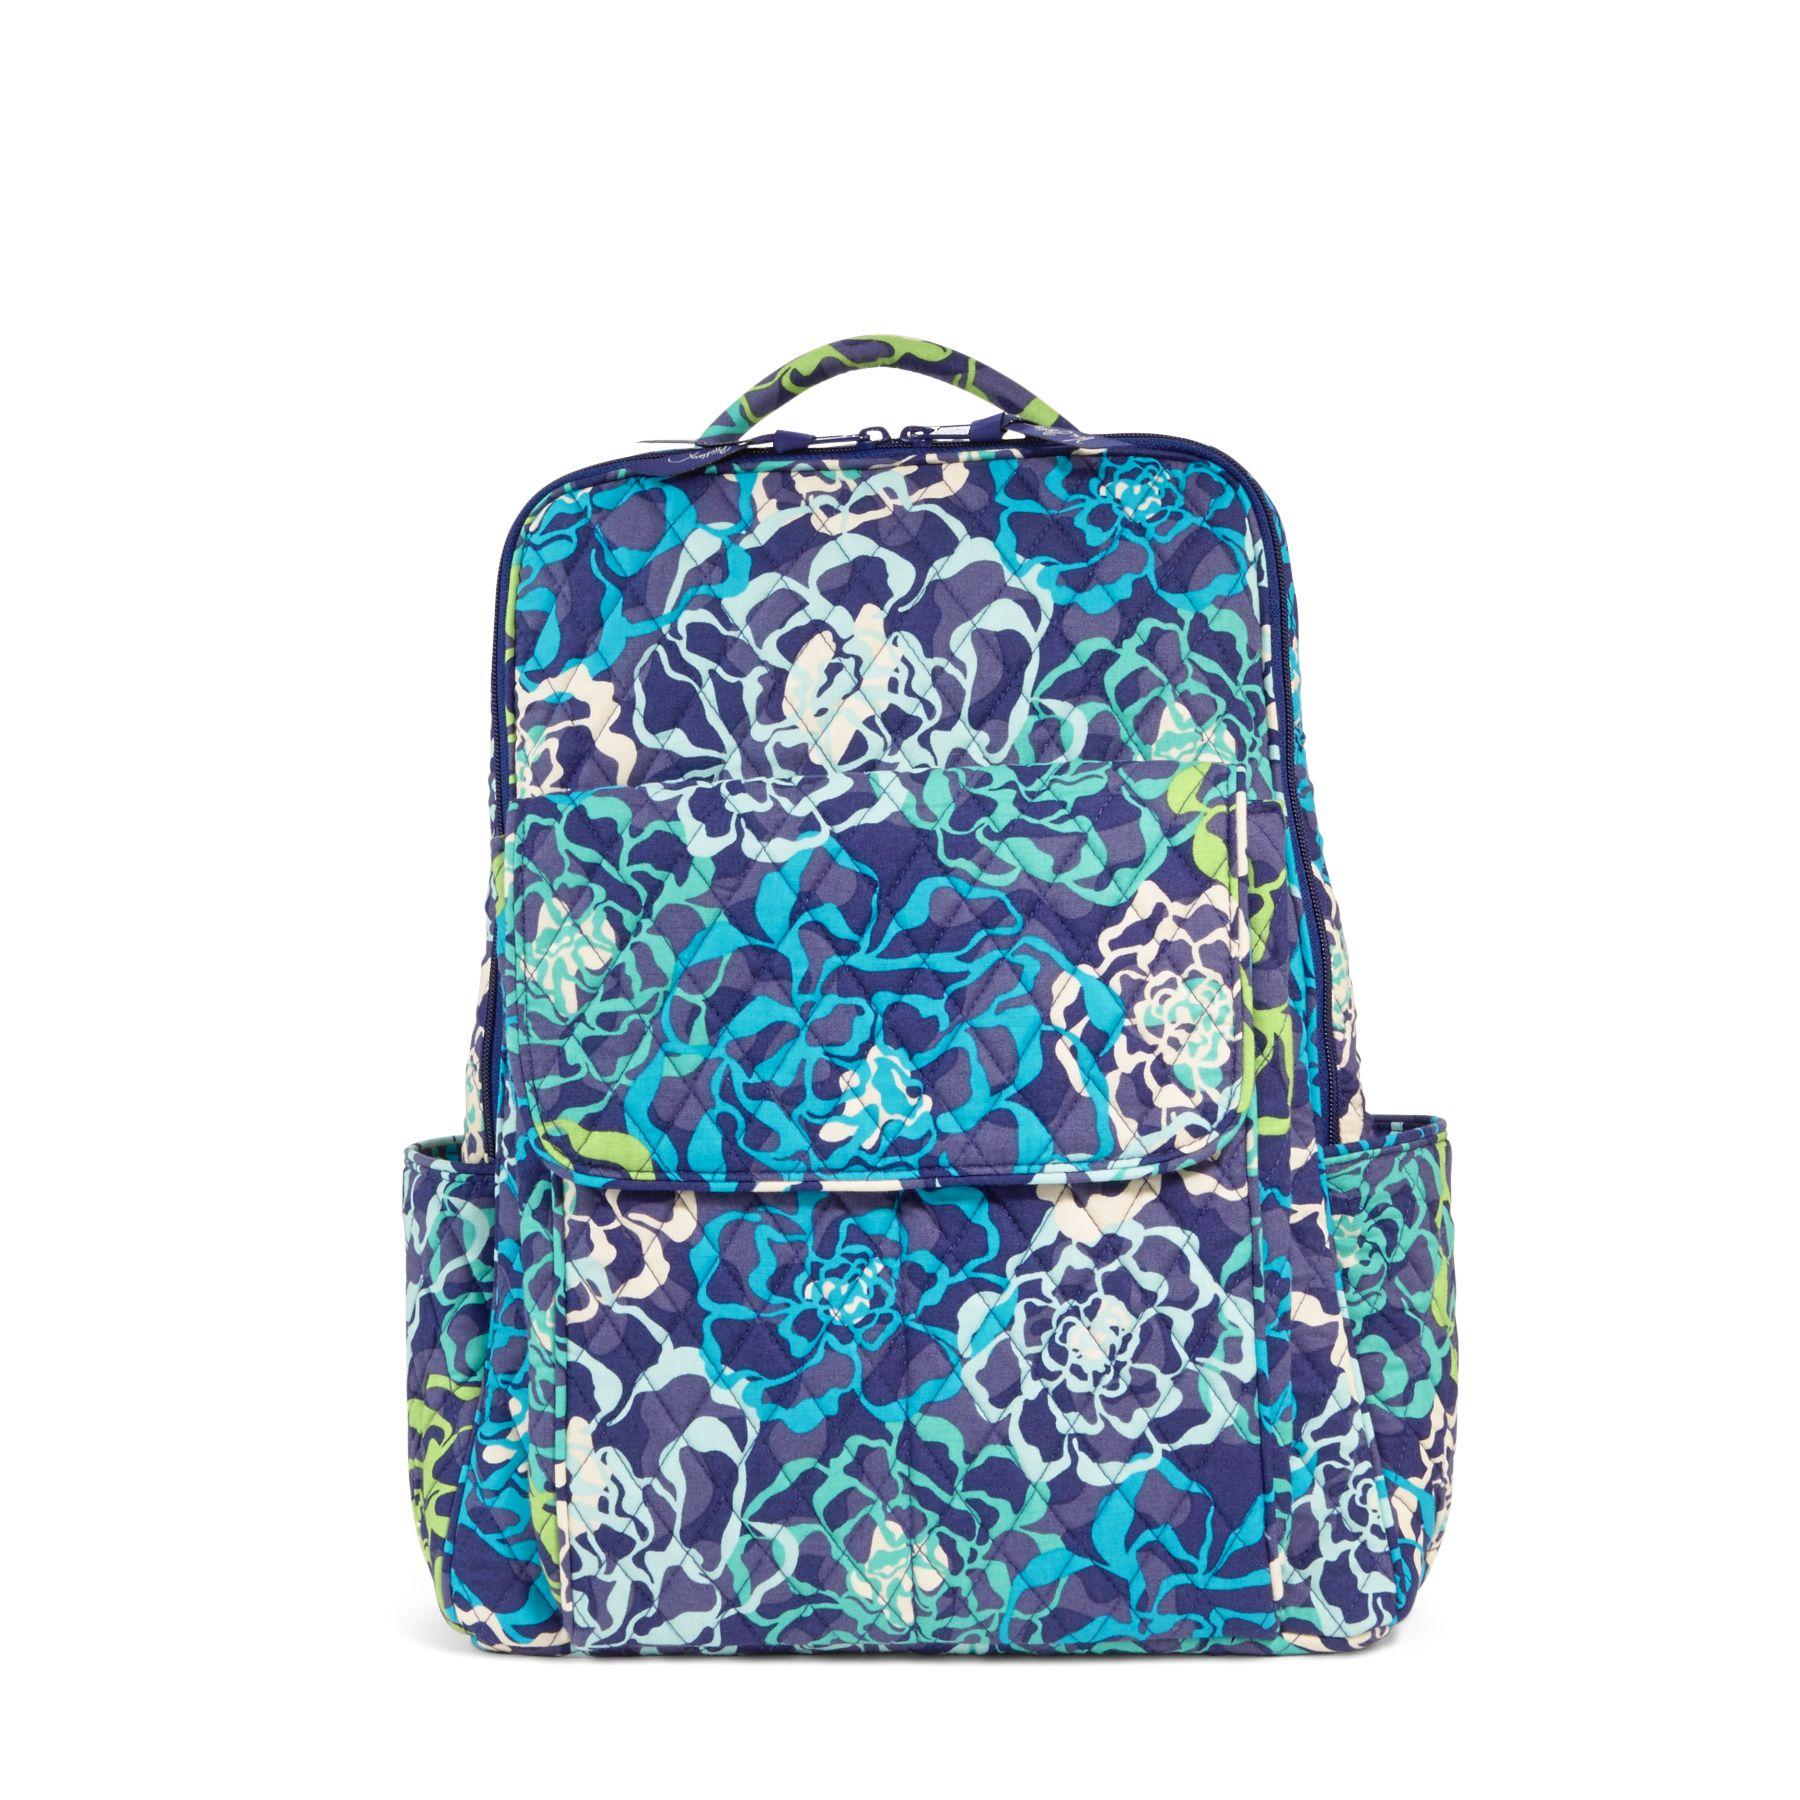 Vera Bradley Ultimate Backpack Bag EBay